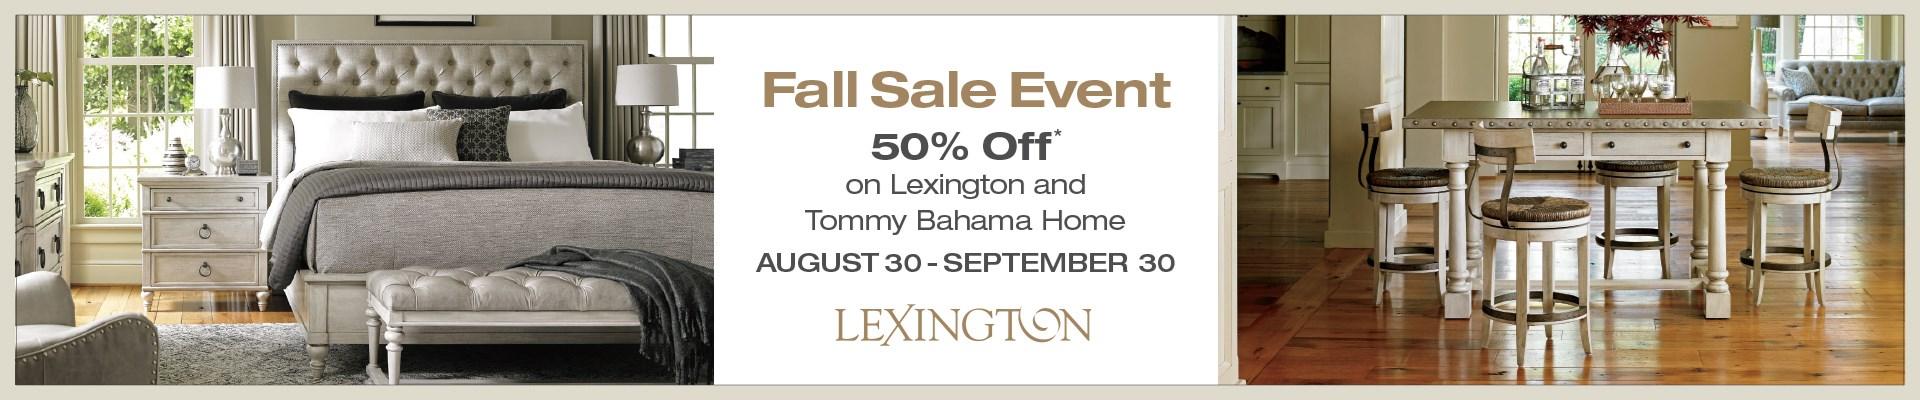 Lexington & Tommy Bahama 50% Off